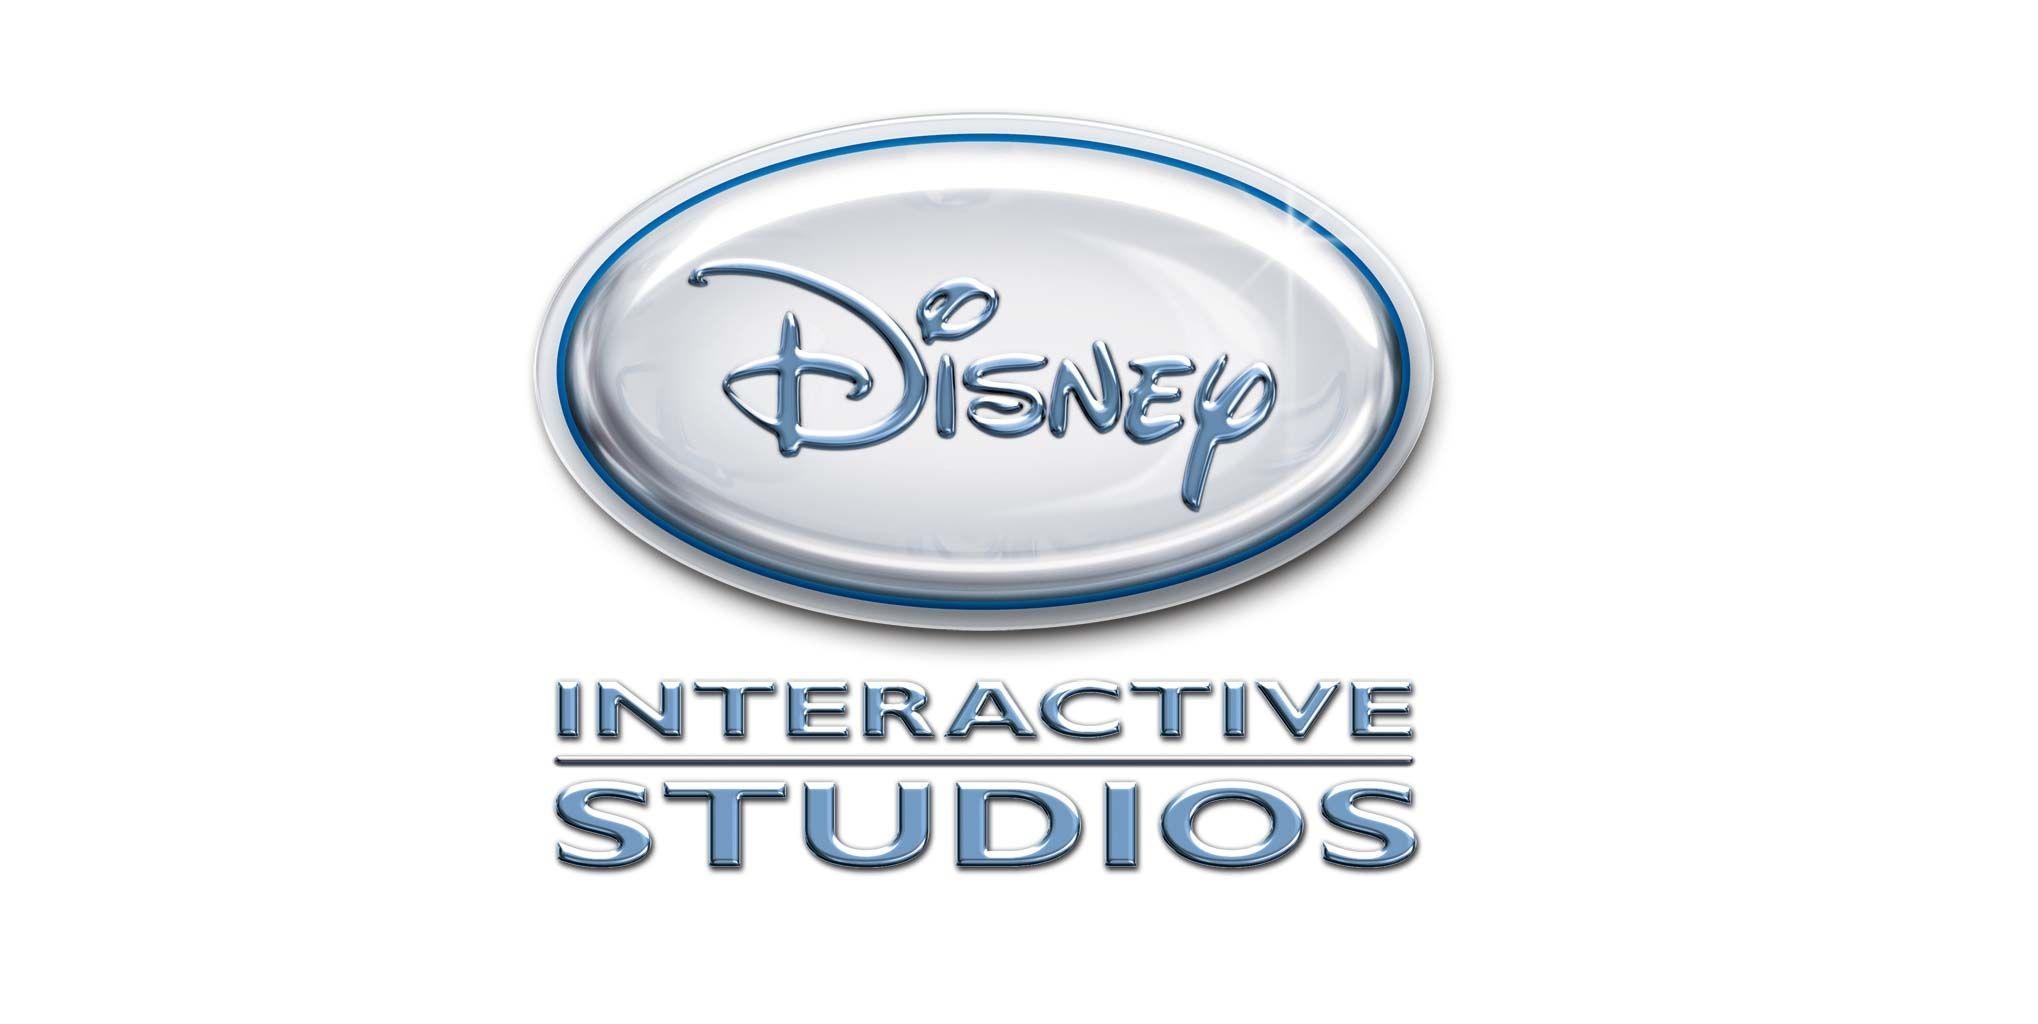 Creditsdisney-interactive-studios